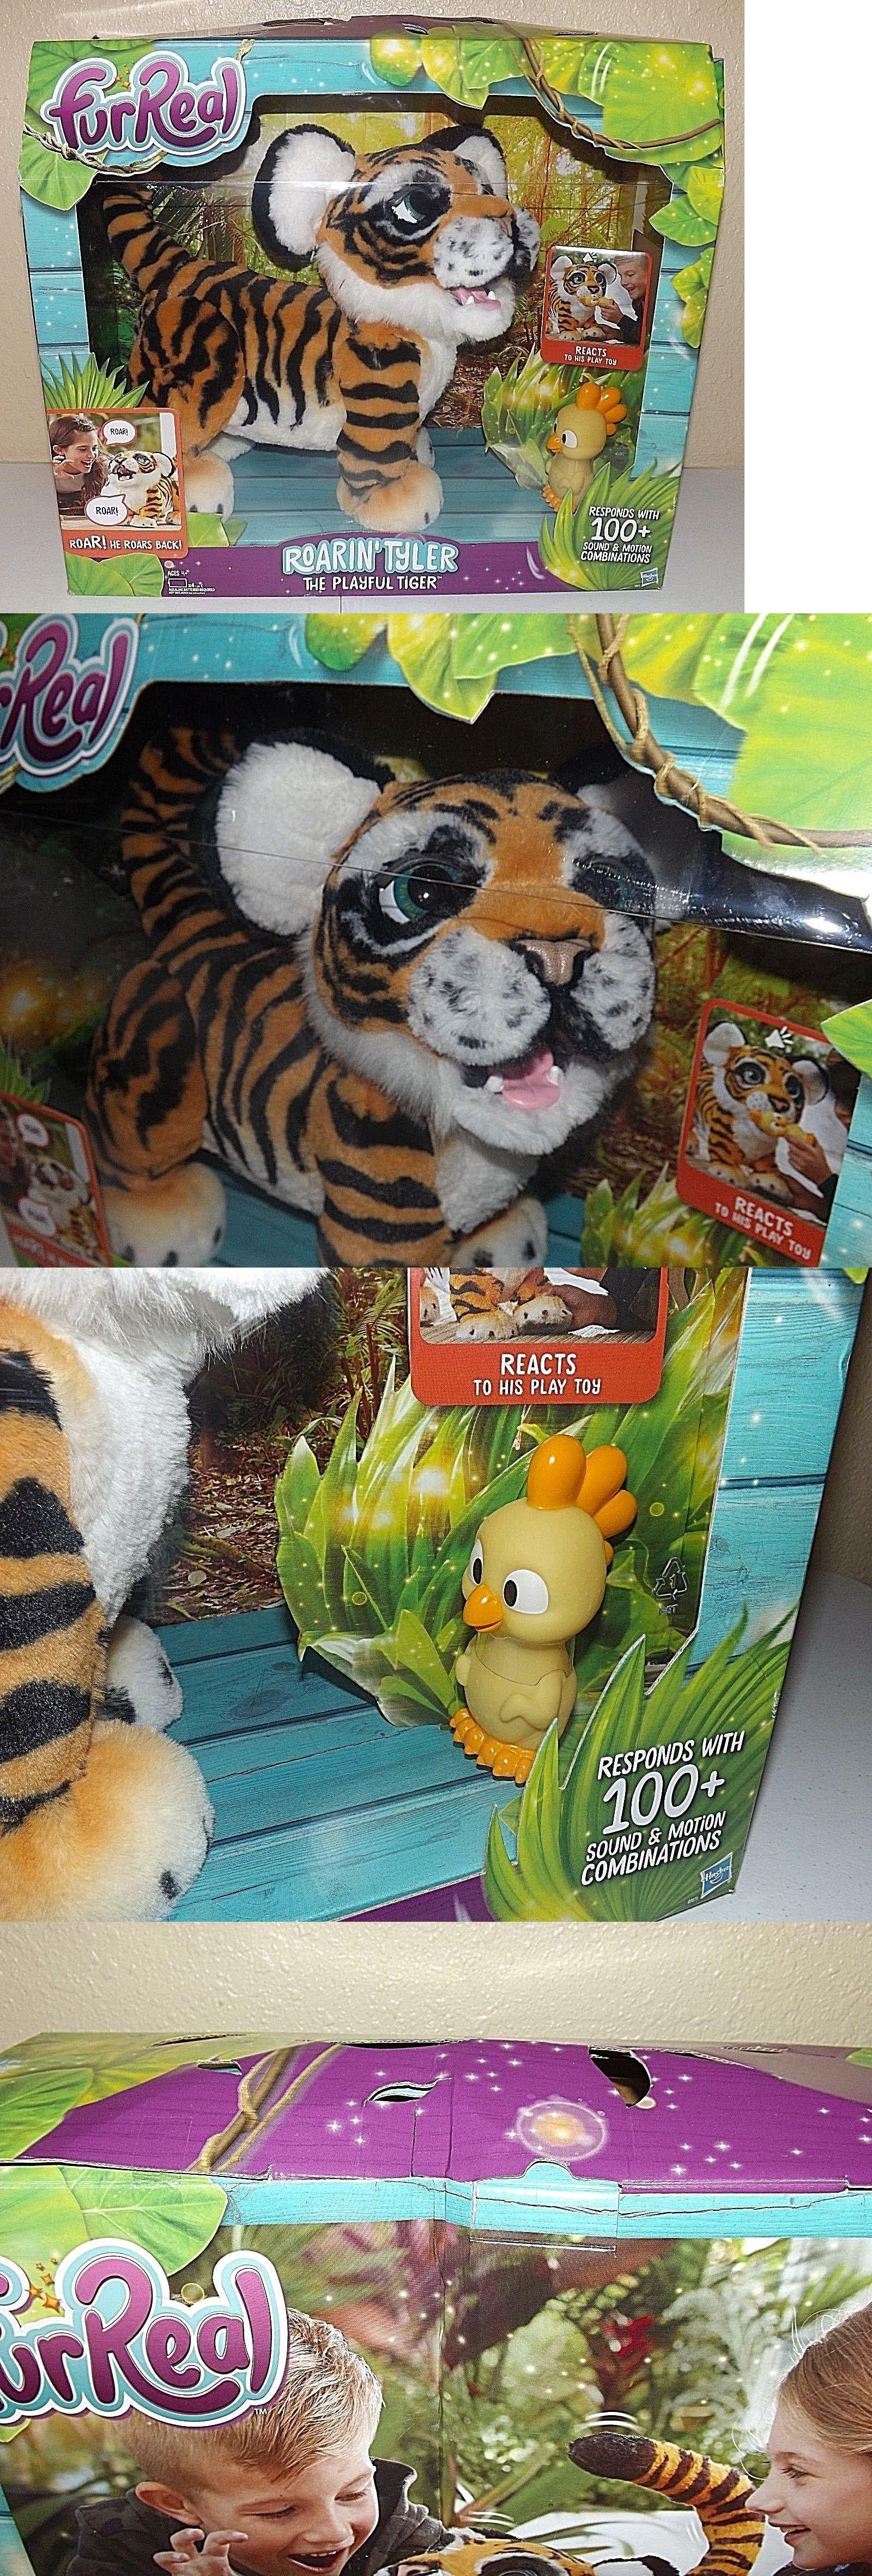 Furreal Friends 38288 Furreal Roarin Tyler The Playful Tiger Kids Toy Pet Fur Real Roaring Hasbro Buy It Now Only 6 Fur Real Friends Kids Toys Tiger Kids